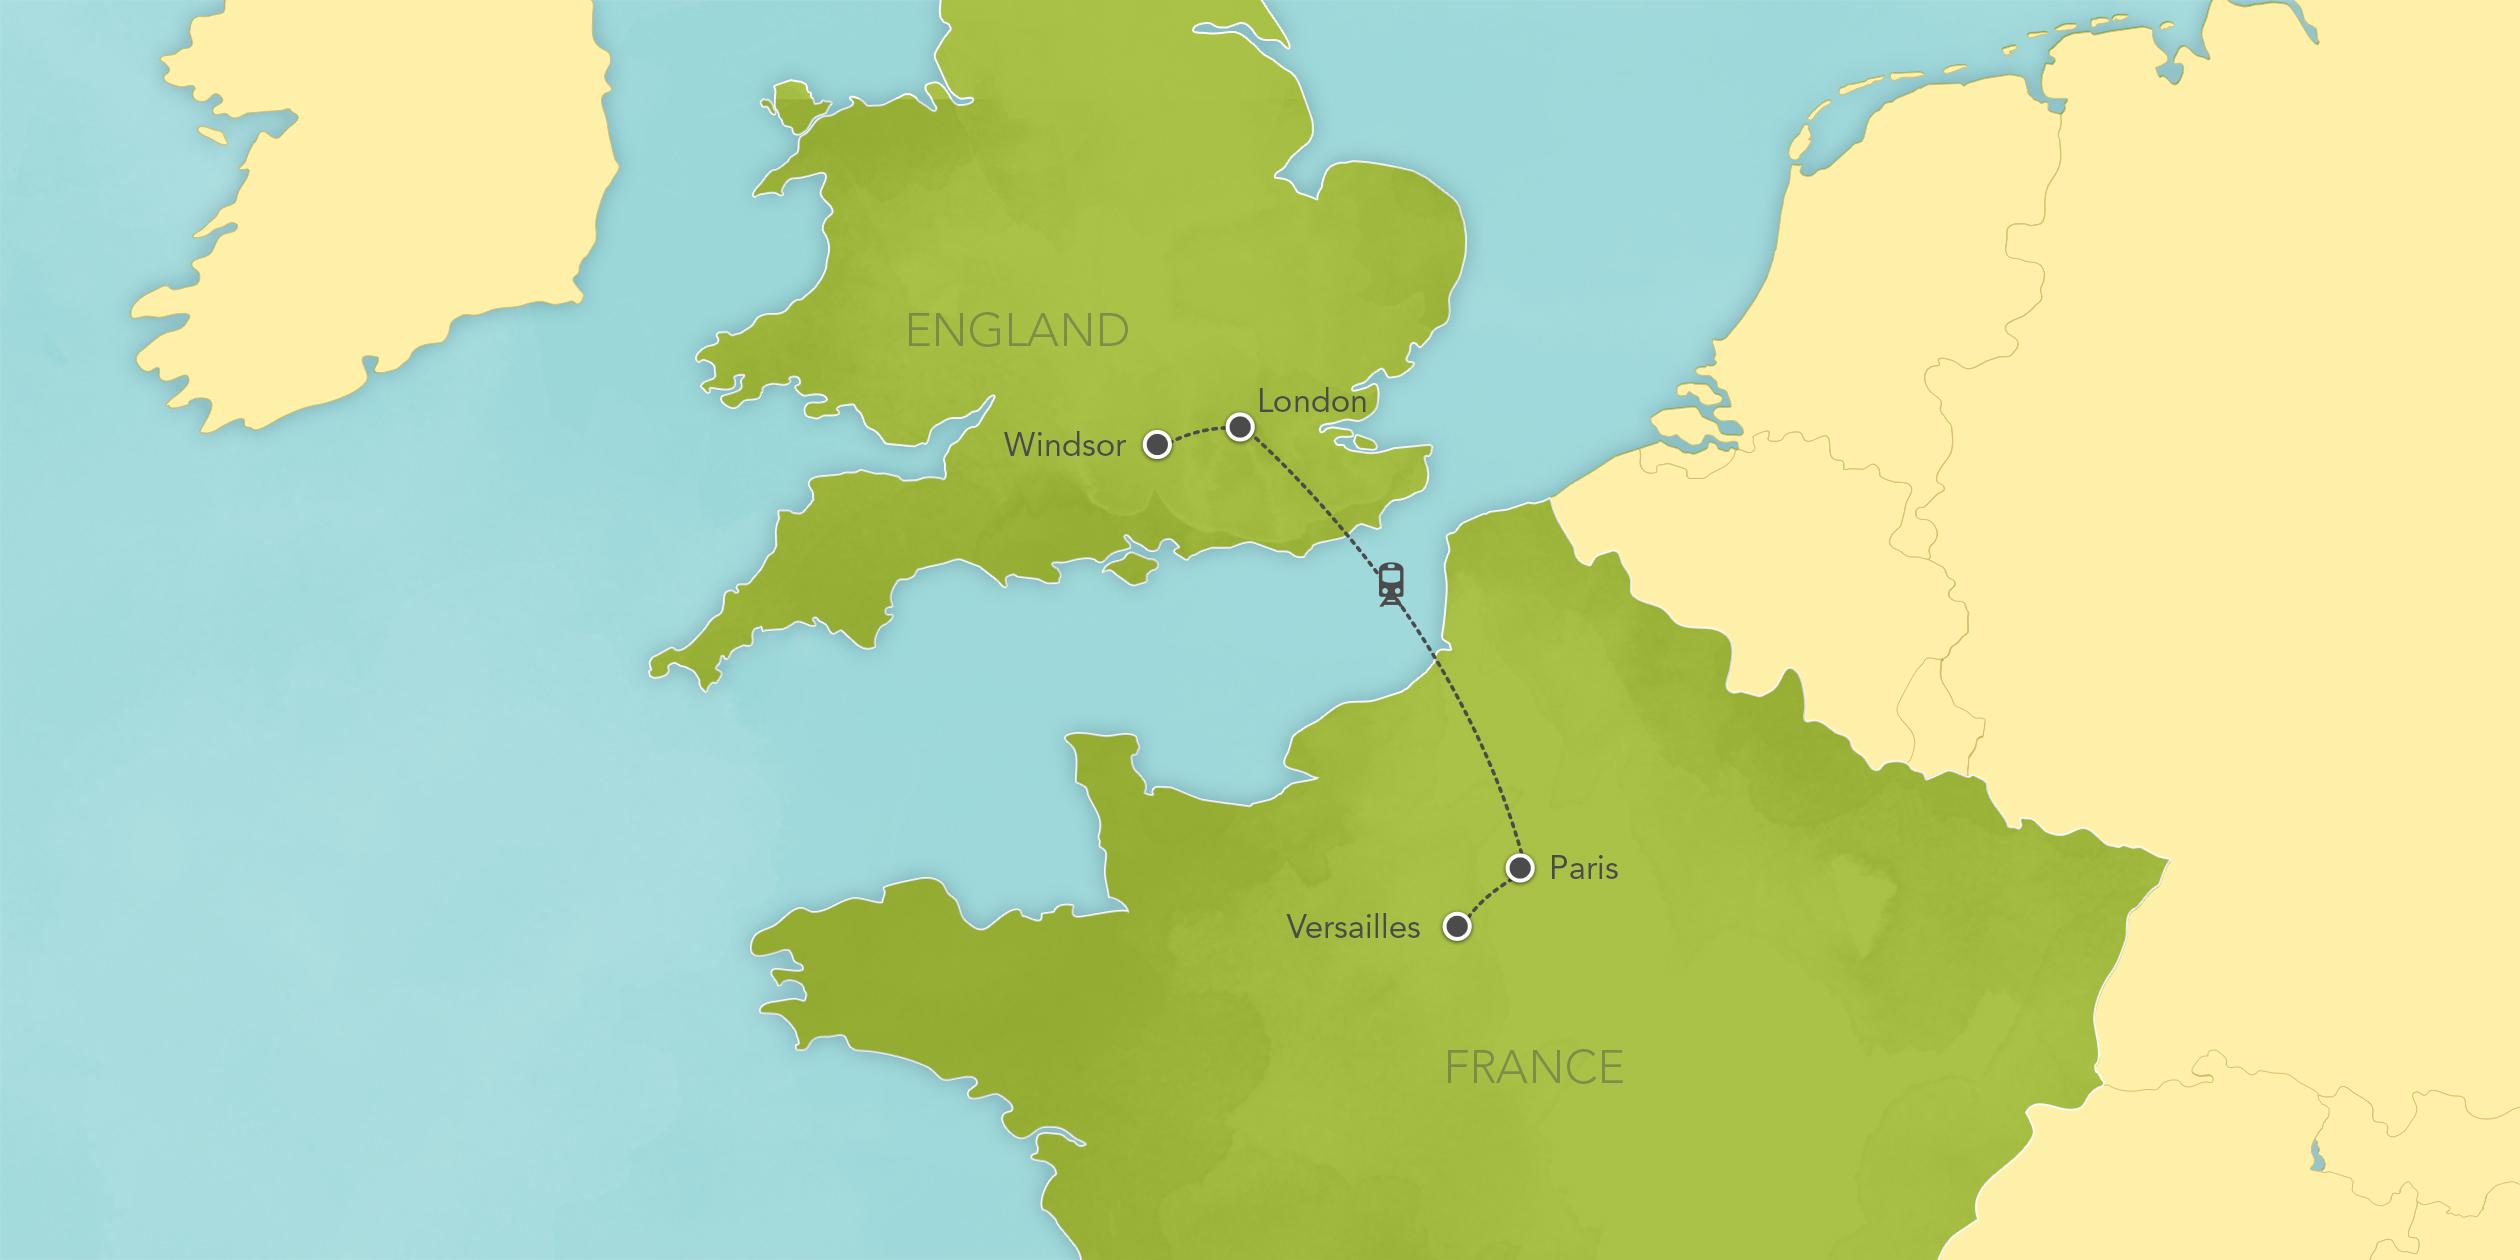 Itinerary map of England & France: London, Paris, Versailles 2018